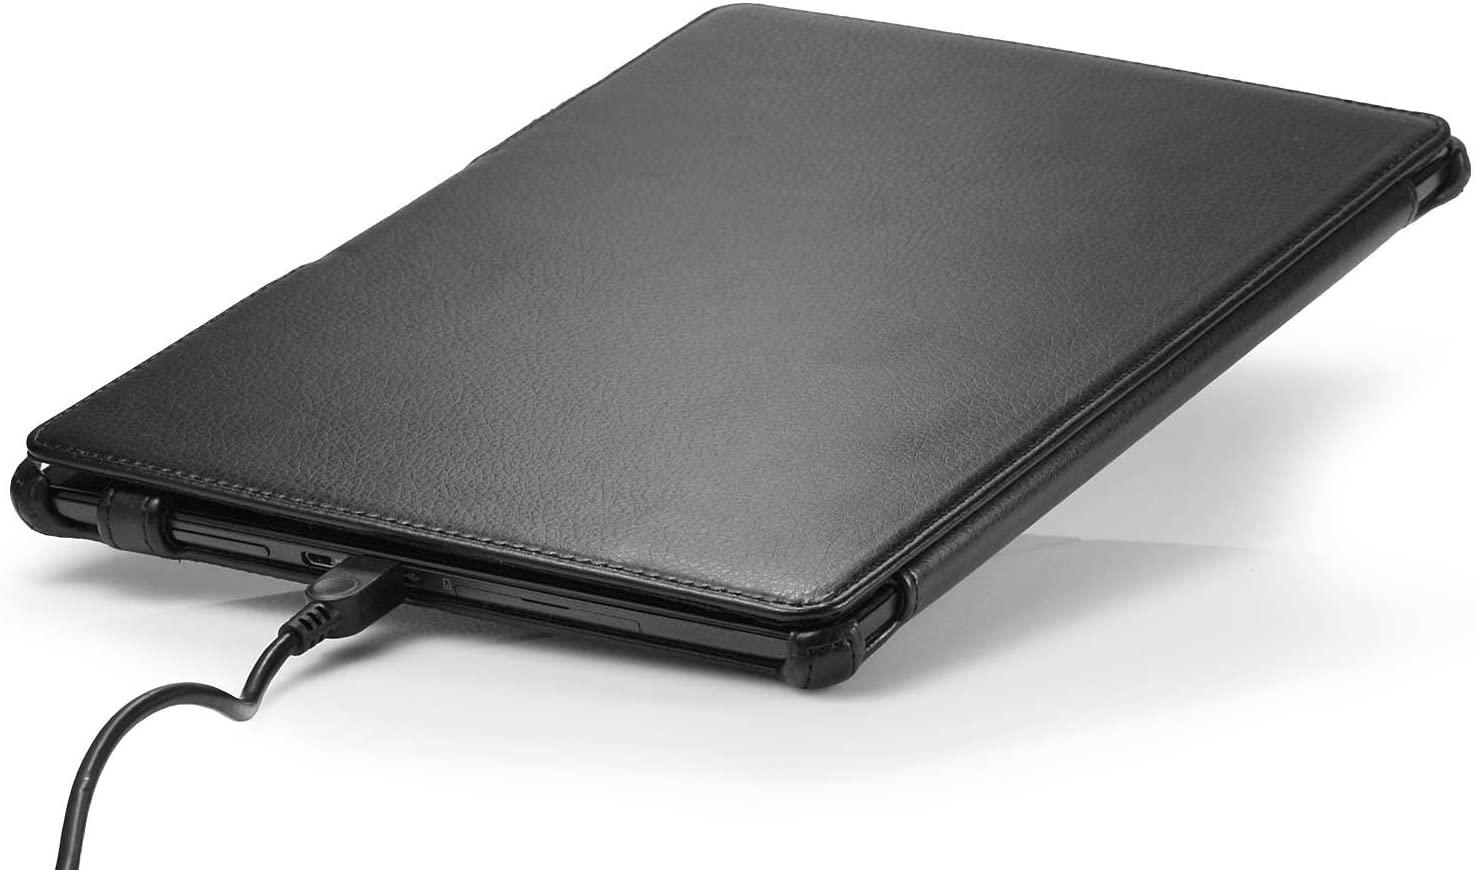 کیف و محافظ صفحه تبلت لنوو S6000